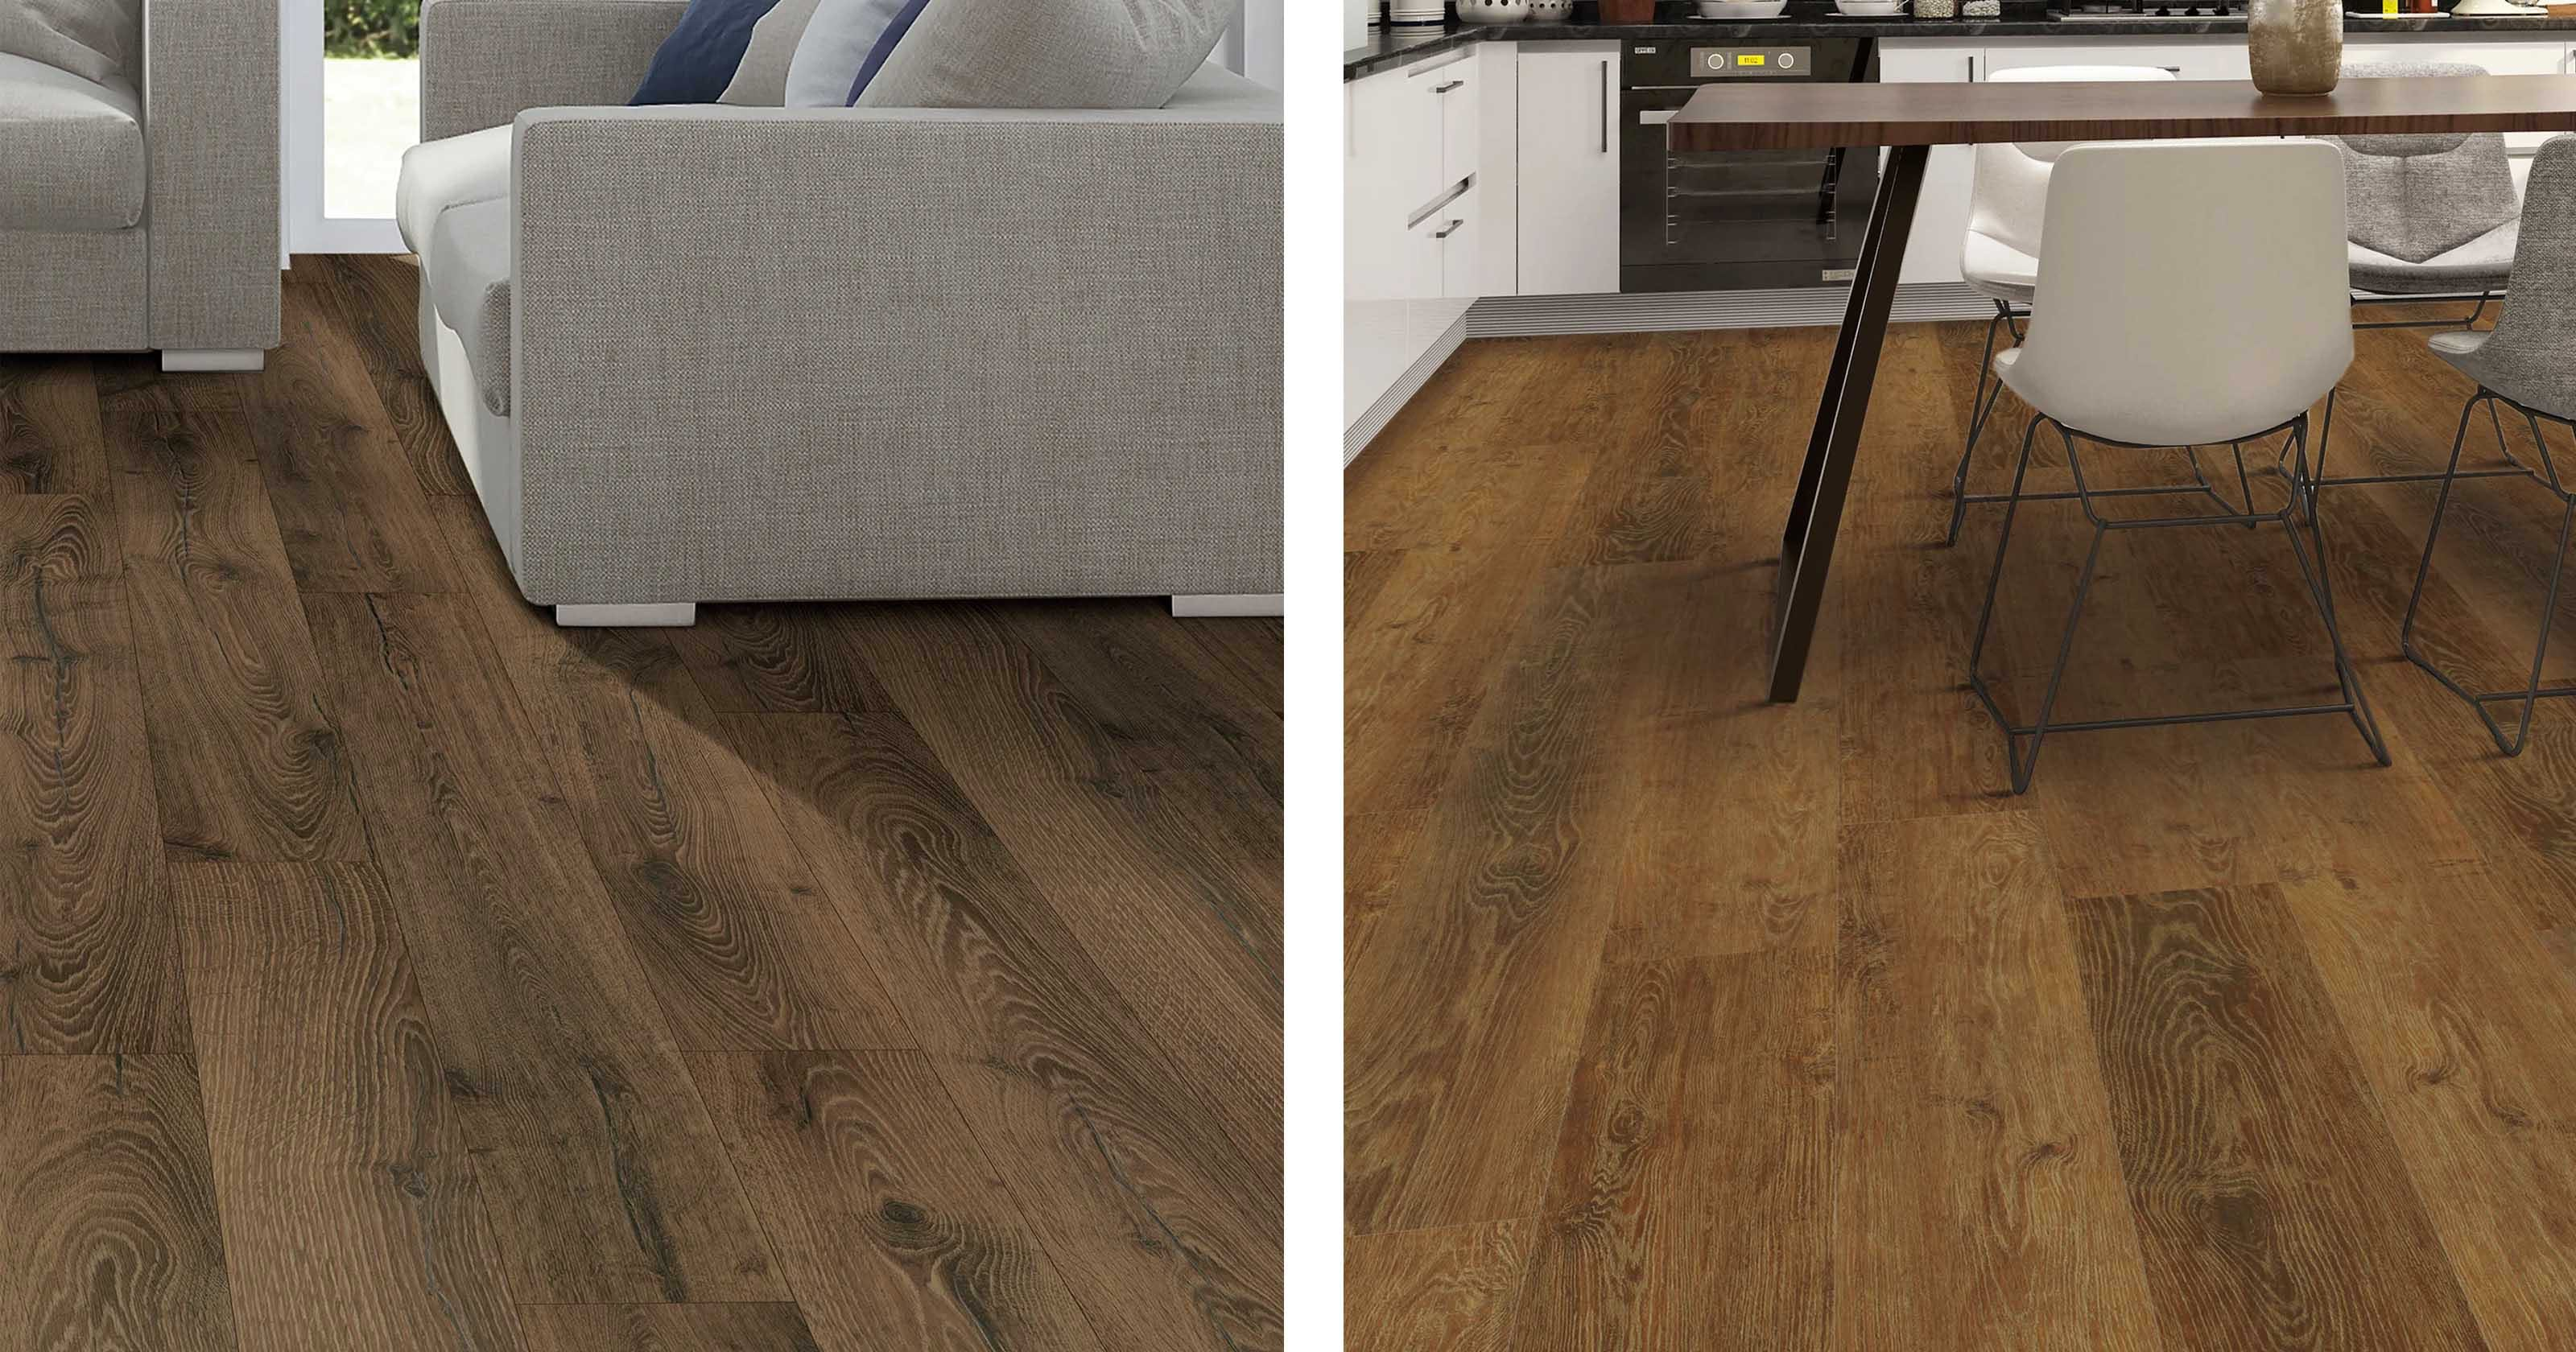 Laminate vs. Vinyl Flooring: Which Is the Better Option?